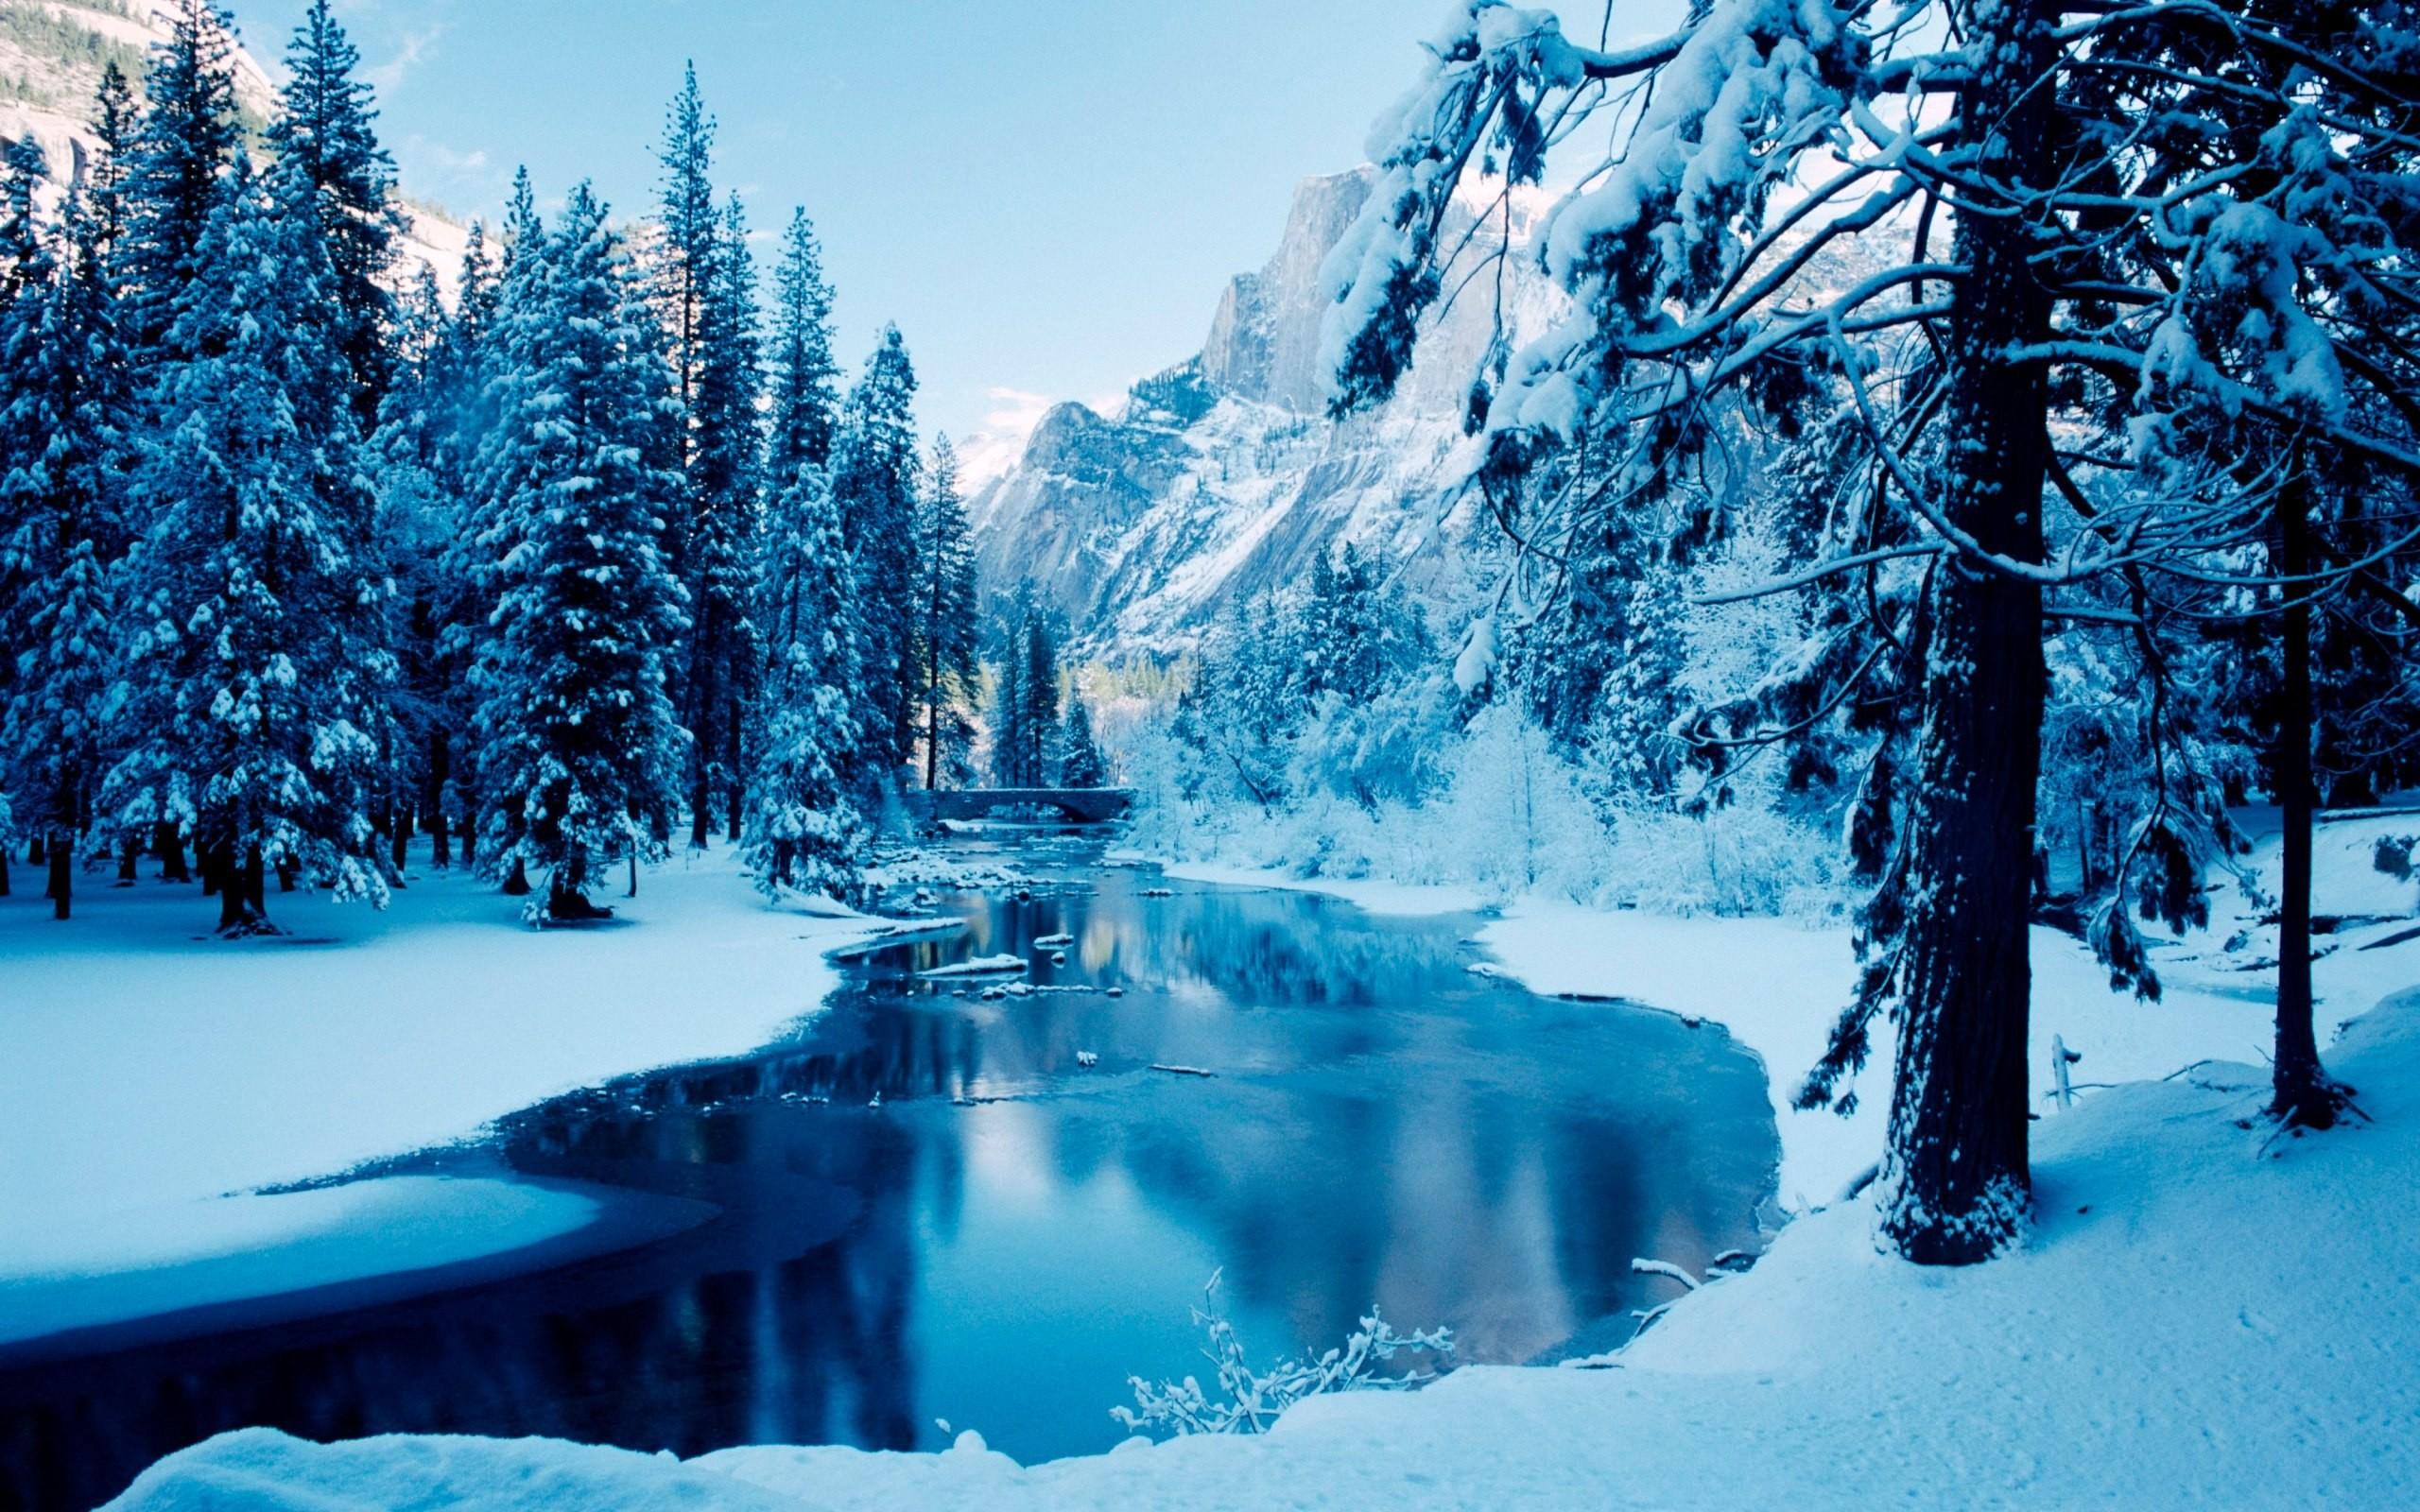 Snowy Desktop Backgrounds 47 Pictures